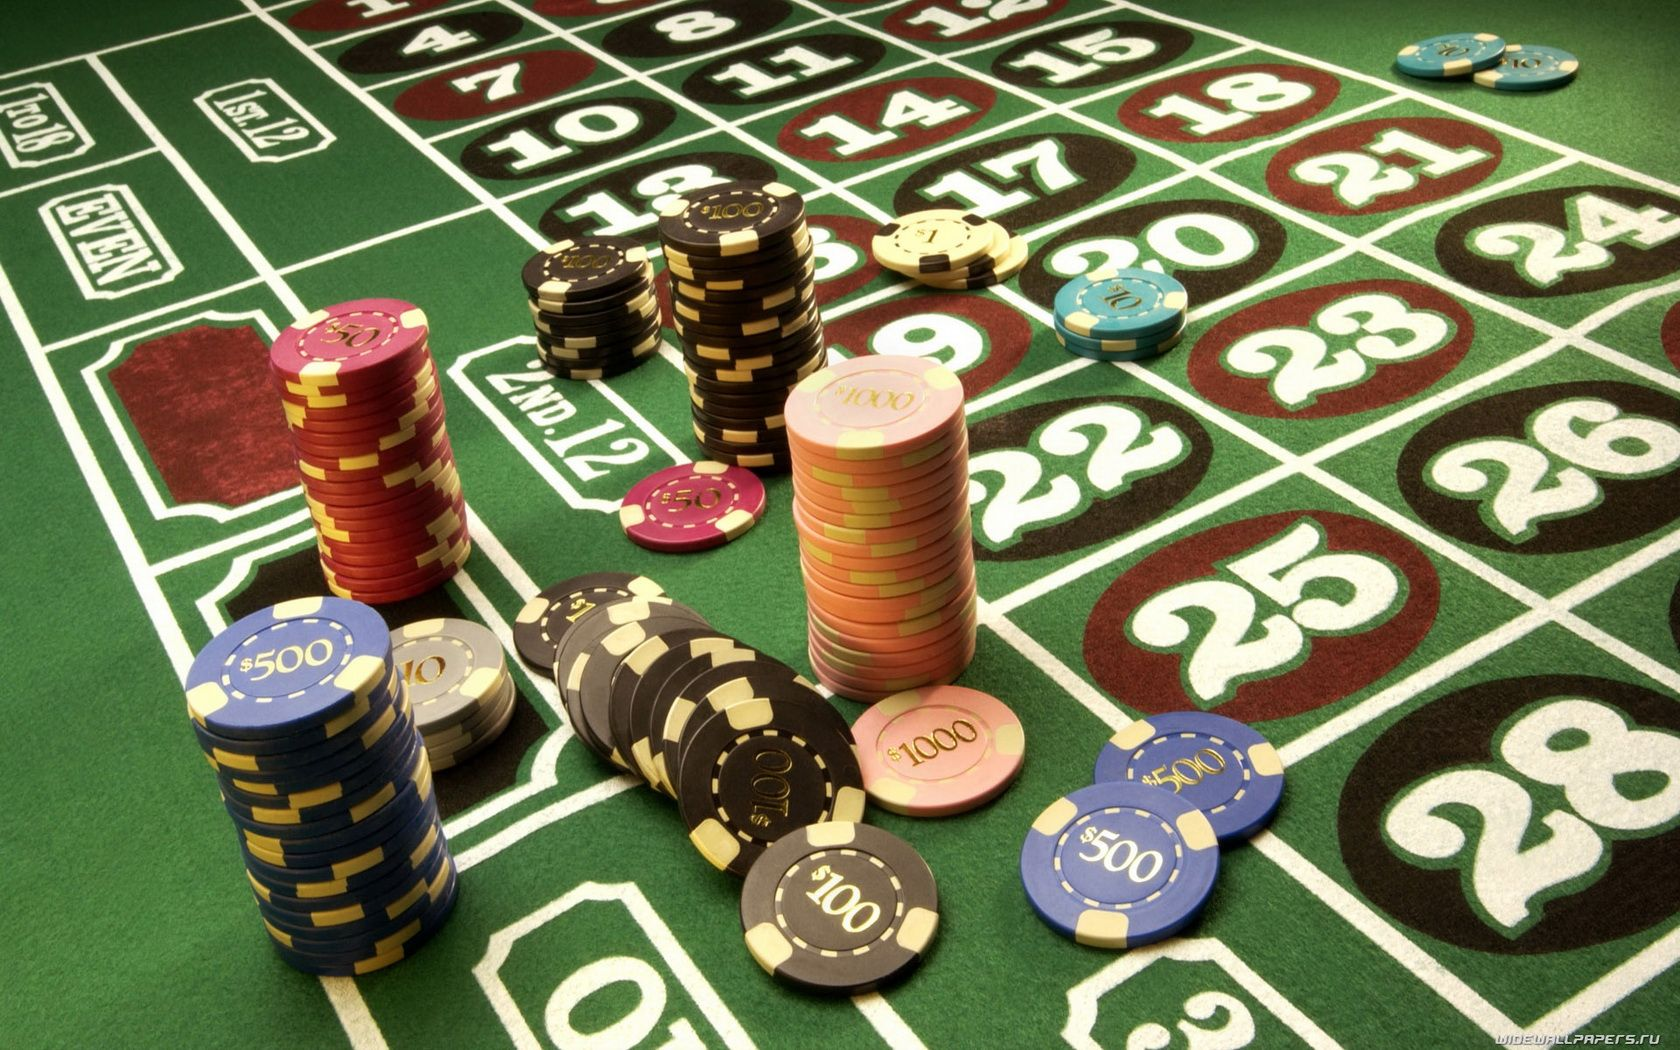 Игры онлайн бесплатно казино покер автамат бесплатна играть игра в онлайн казино закон